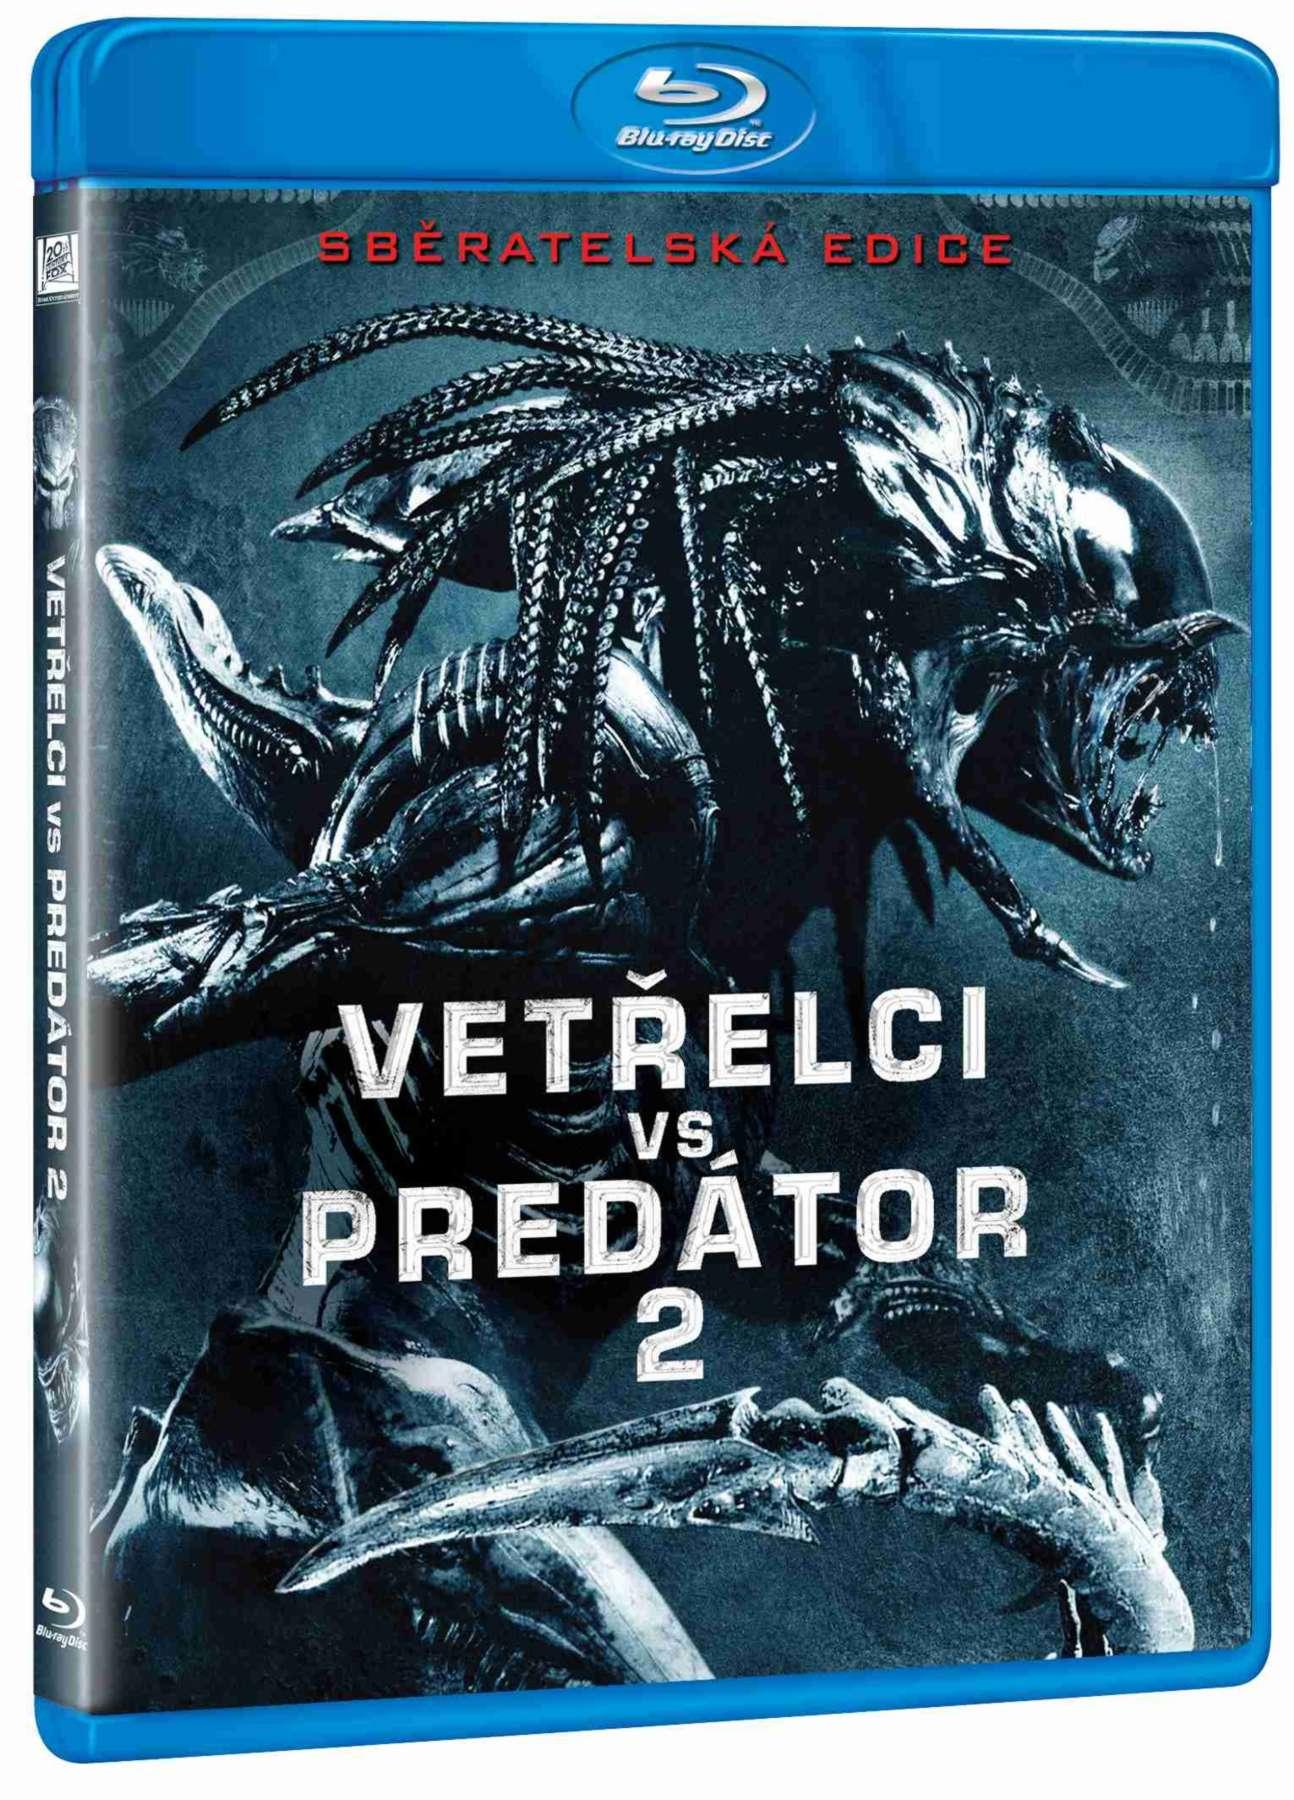 VETŘELCI VS PREDÁTOR 2 - Blu-ray